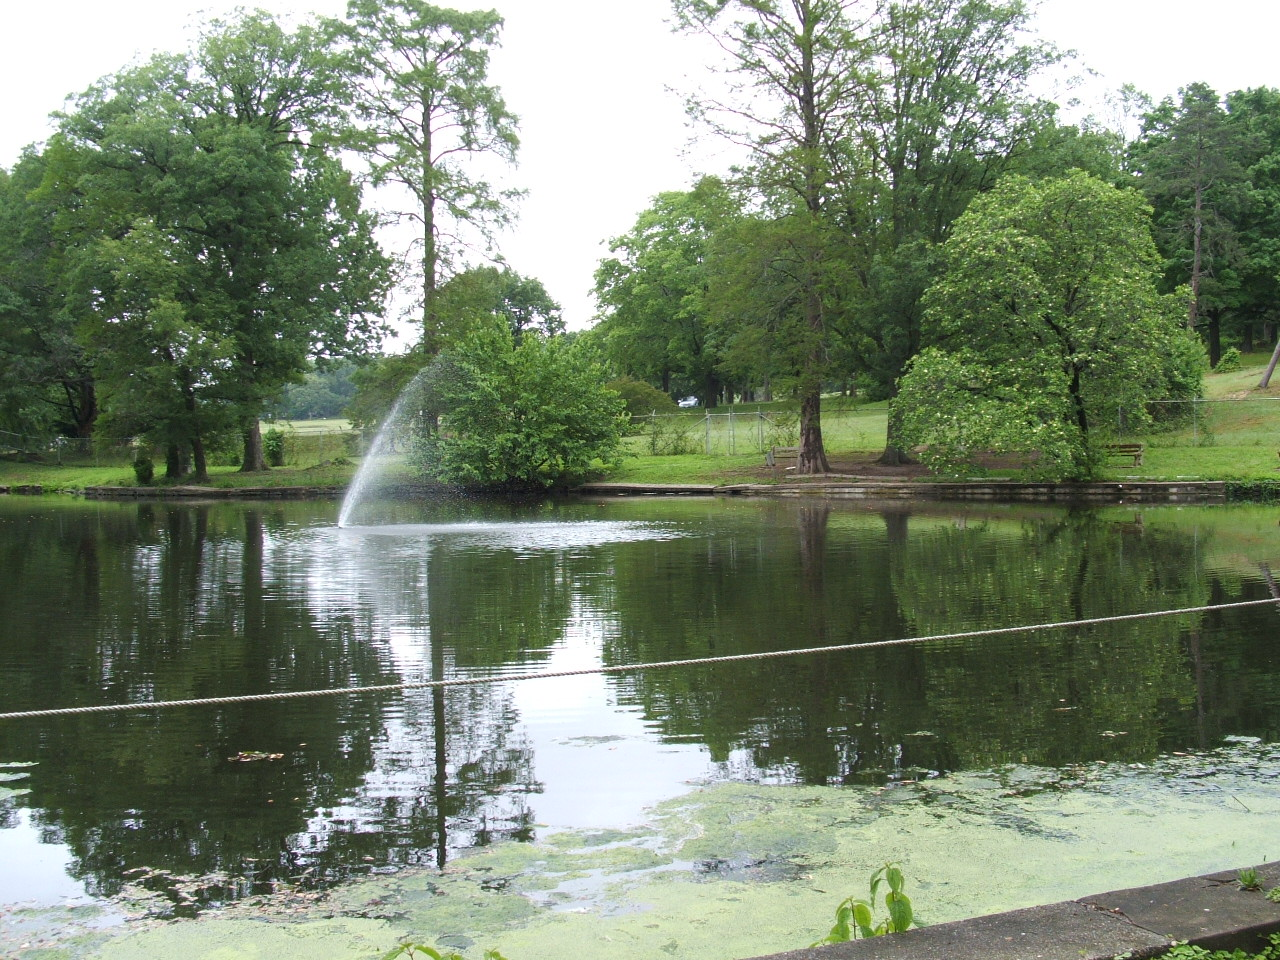 AFRH - Historic Meadow Restoration & Golf Course Expansion Design